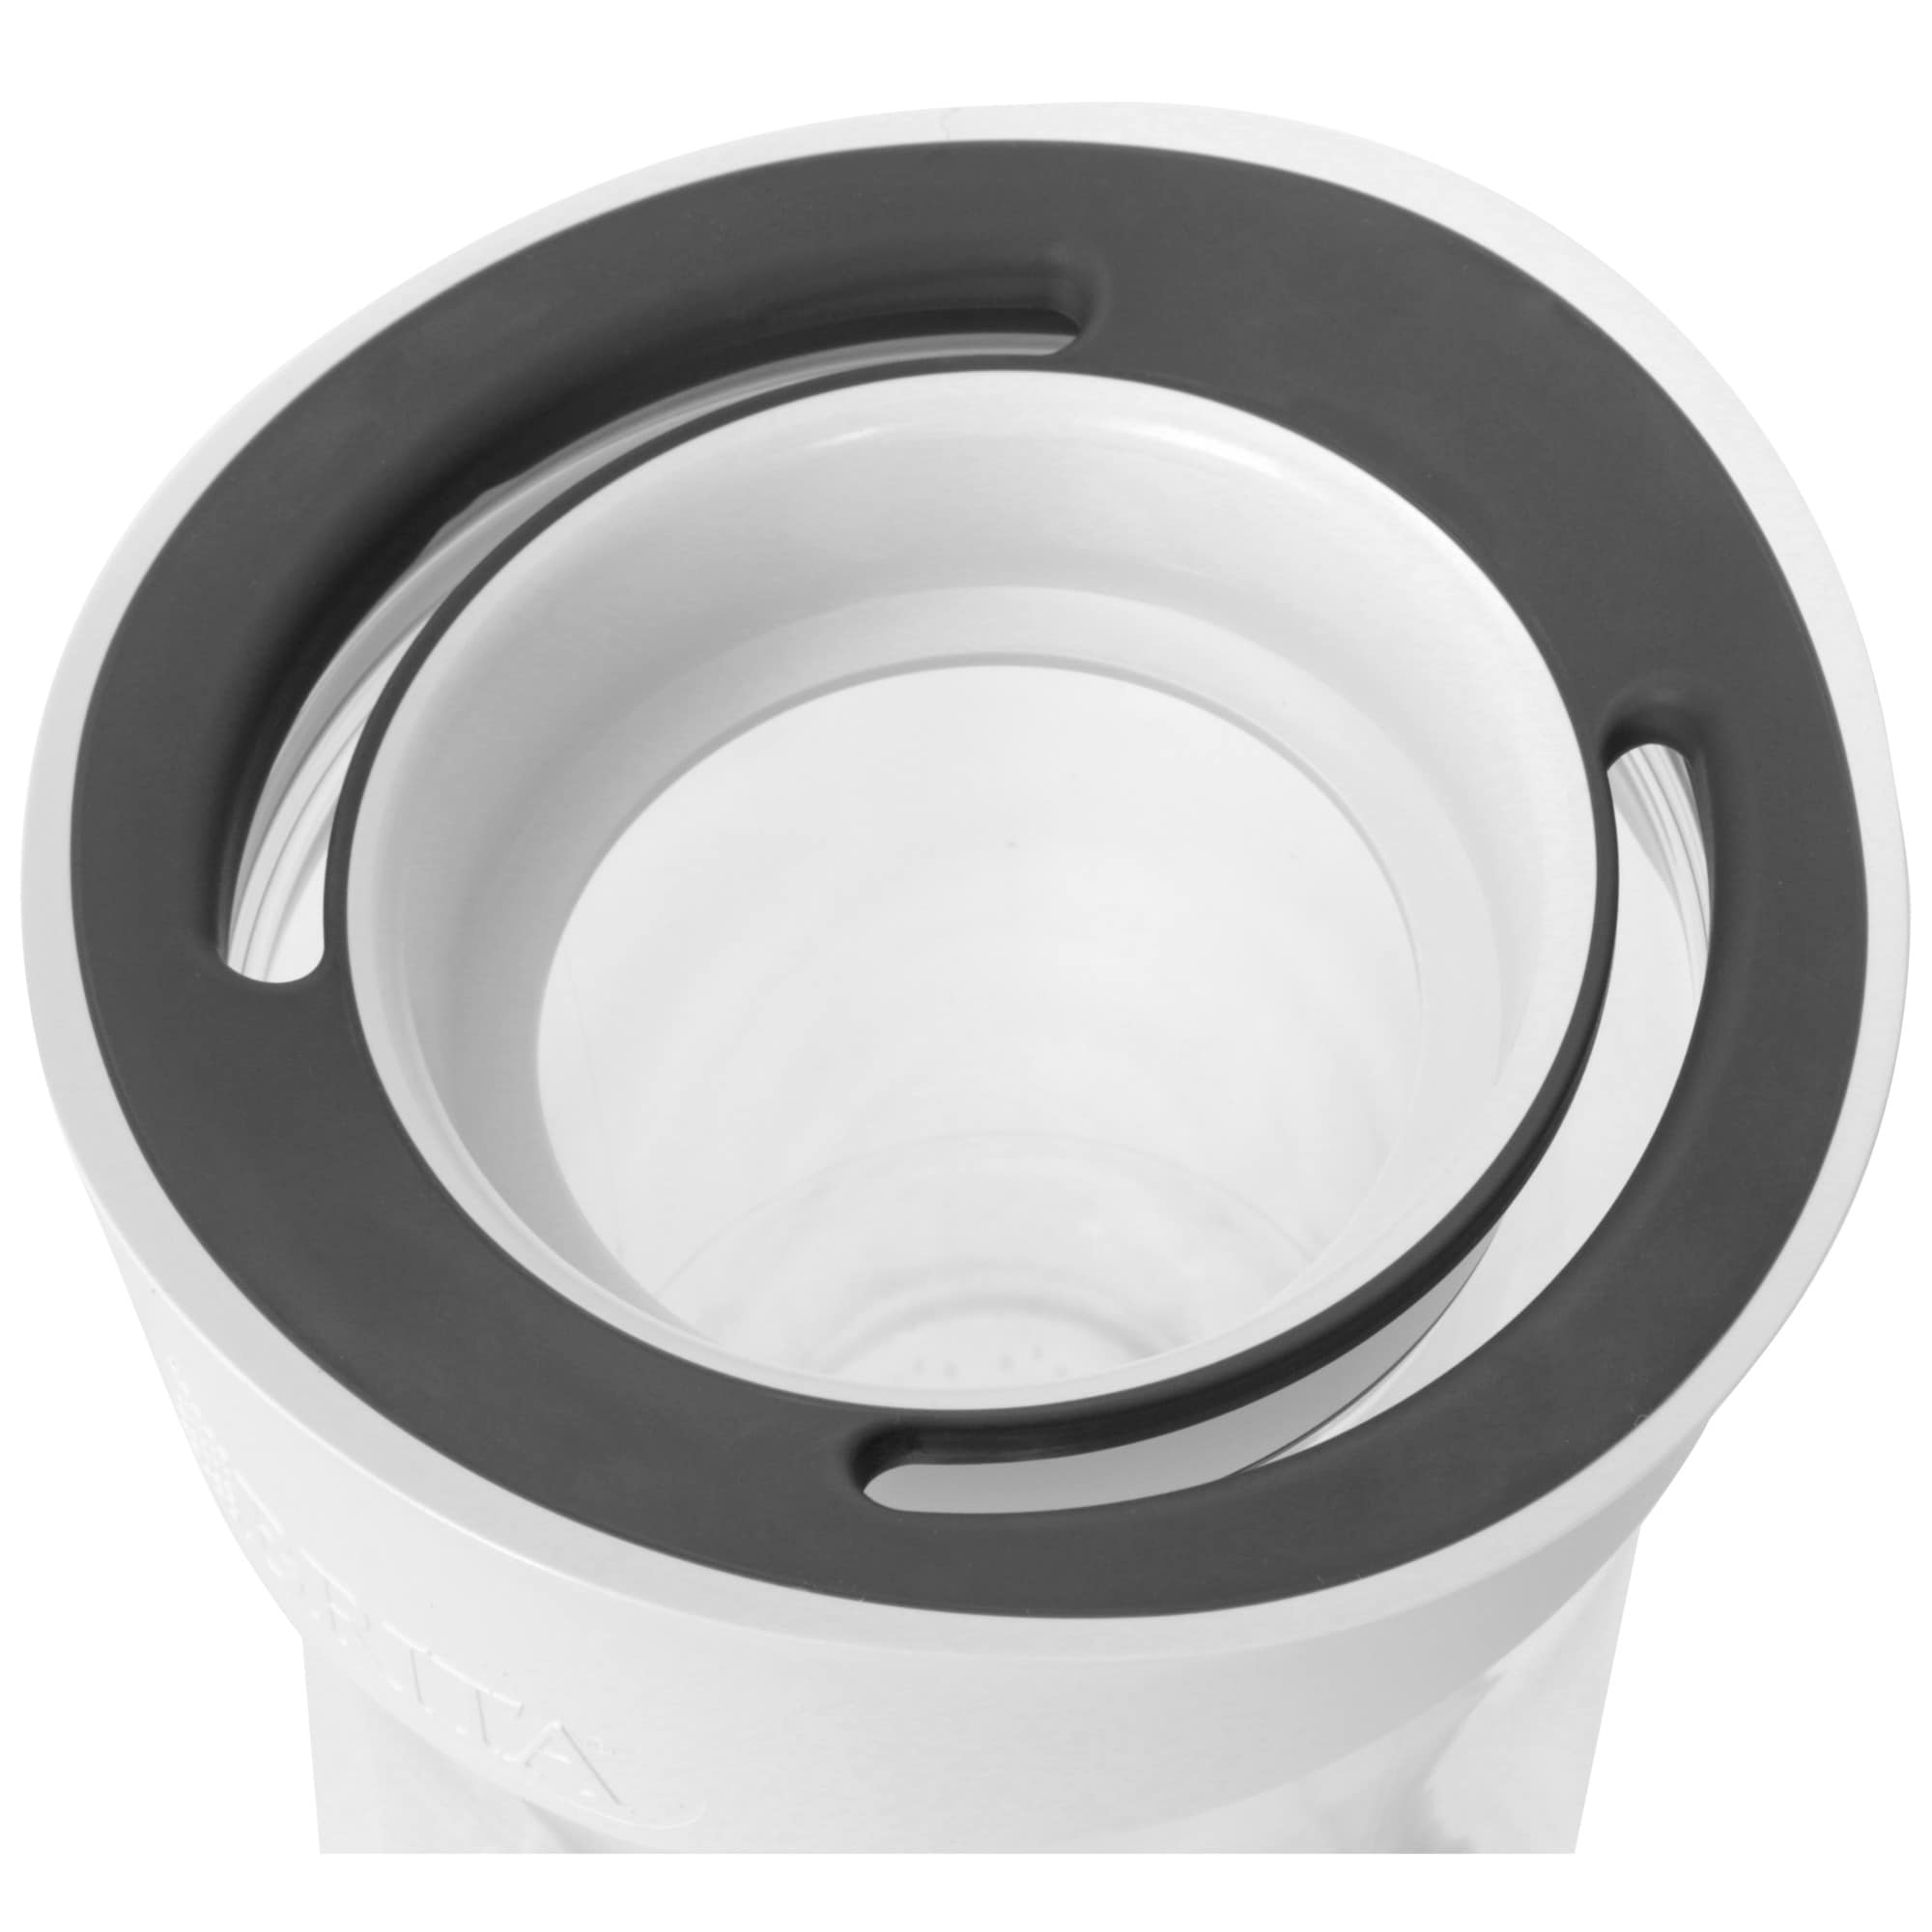 Brita Wasserfilter fill&serve Mind 1,3 Liter